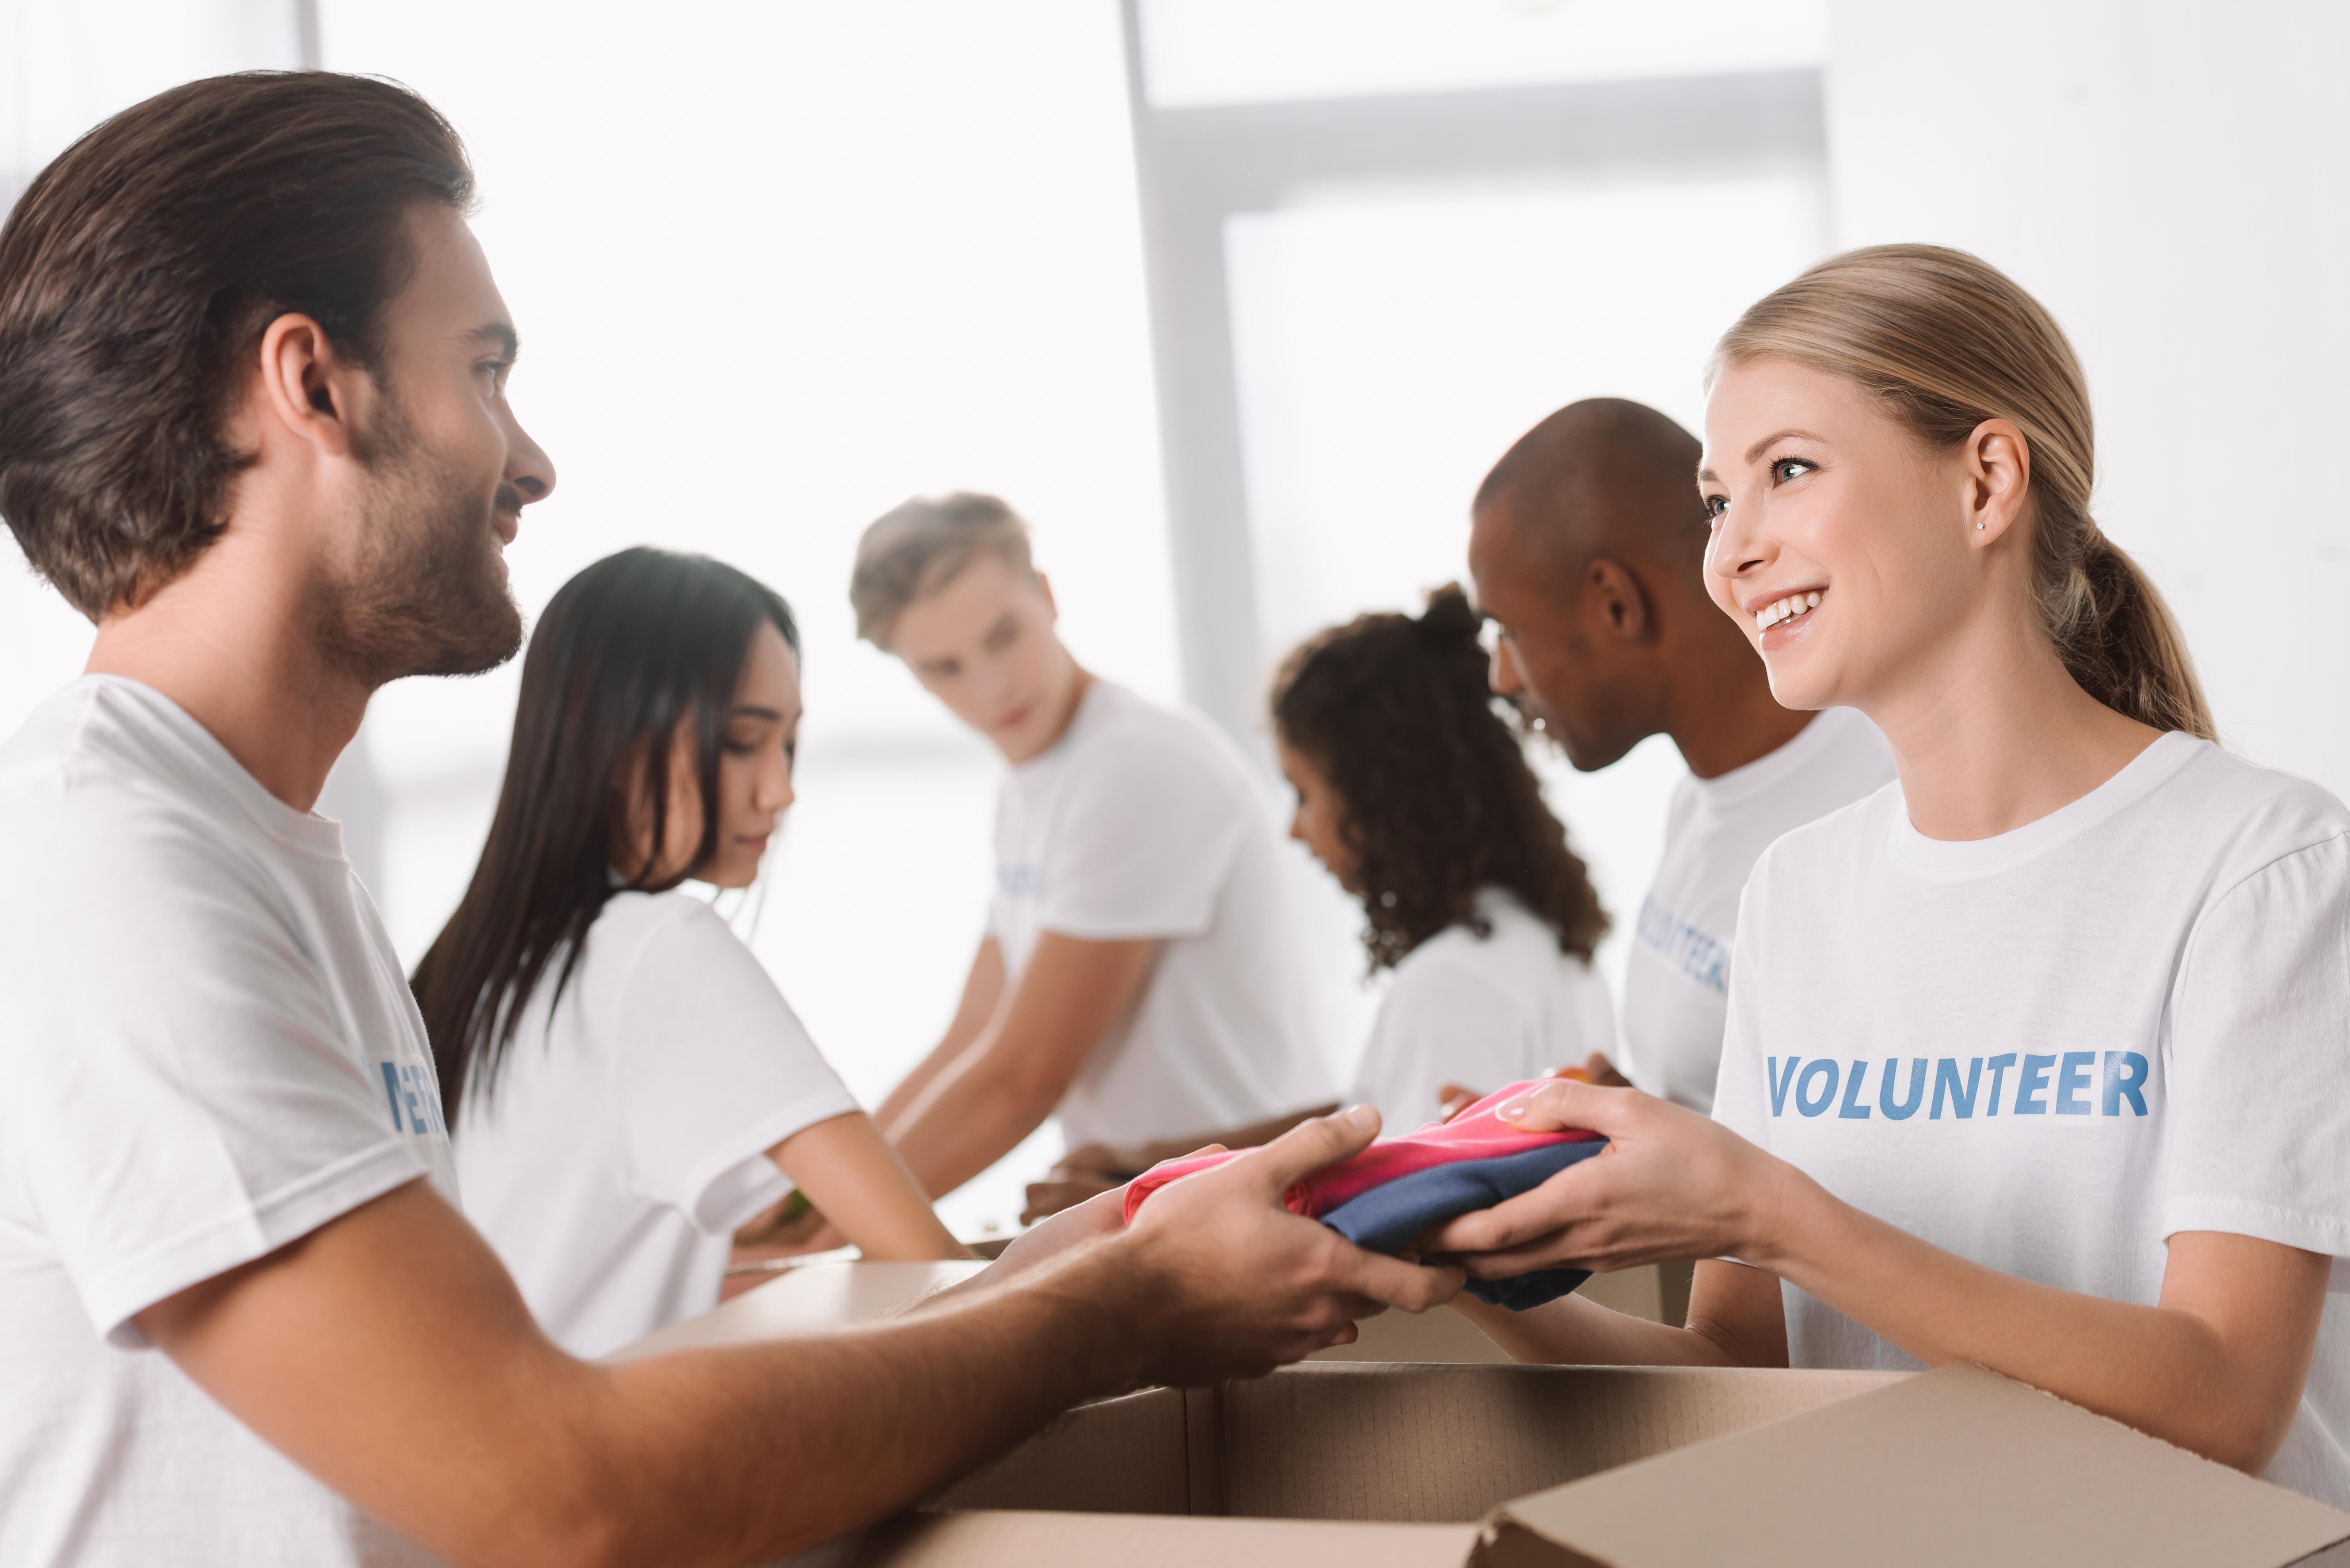 volunteer image - community services